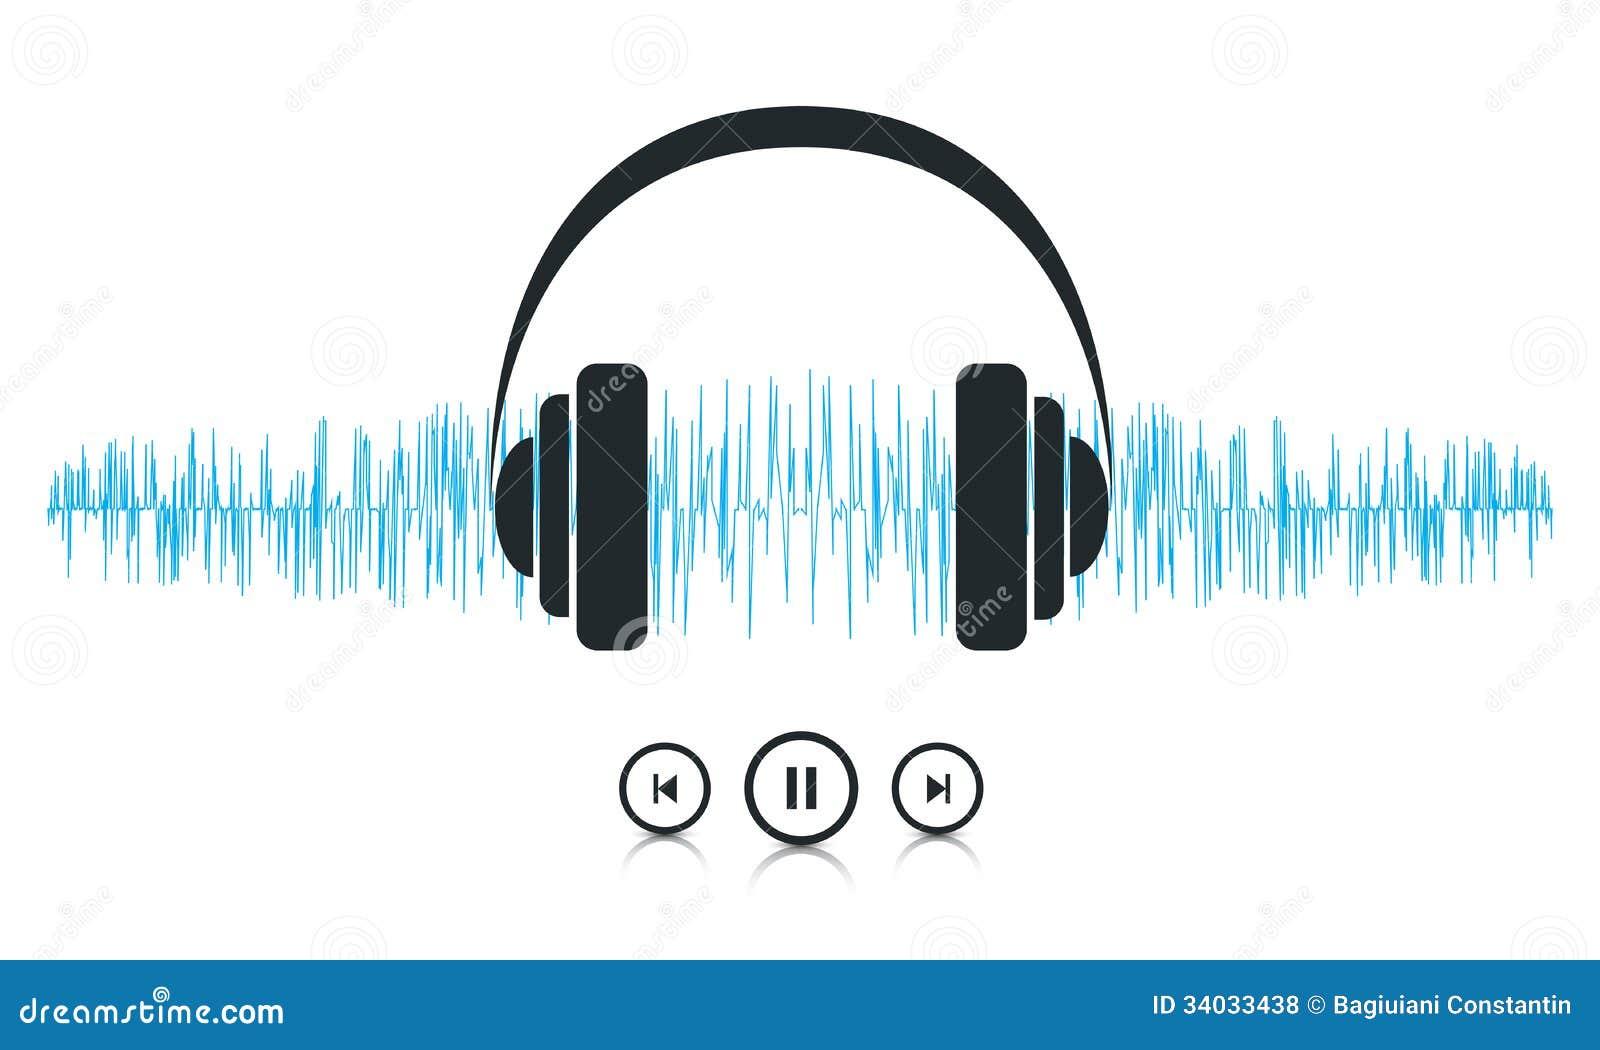 music sound waves stock vector illustration of modern 34033438 rh dreamstime com